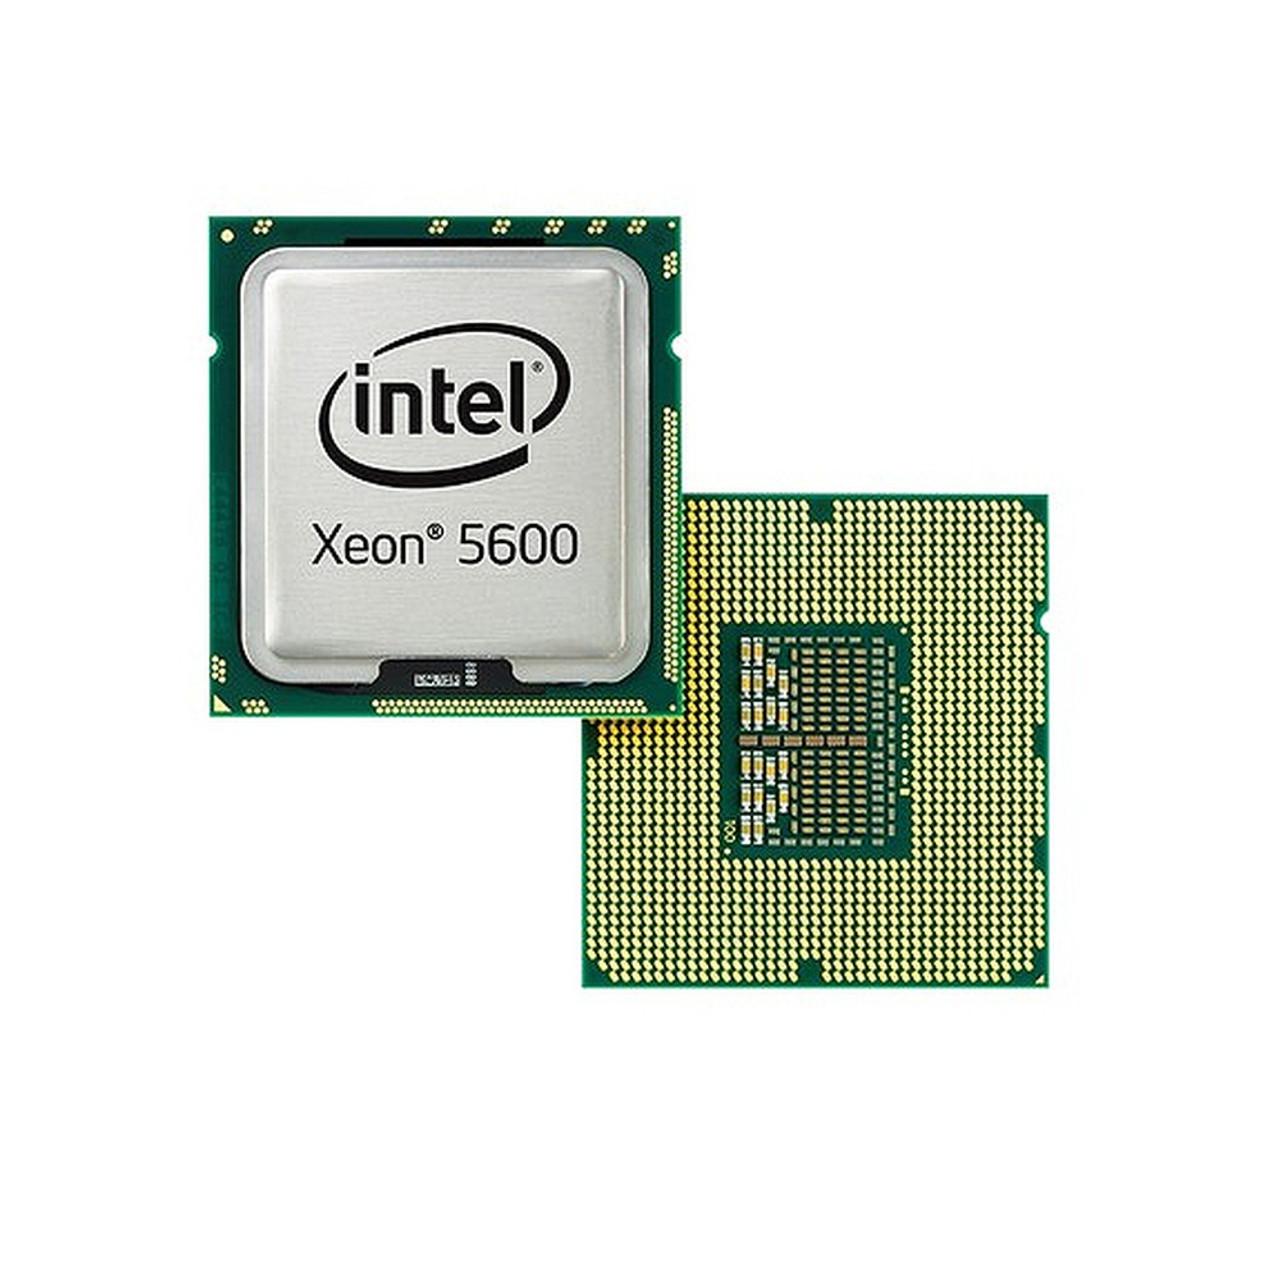 2.66 GHz FCLGA1366 Westmere EP Server Processor intel X5650 Six Core SLBV3